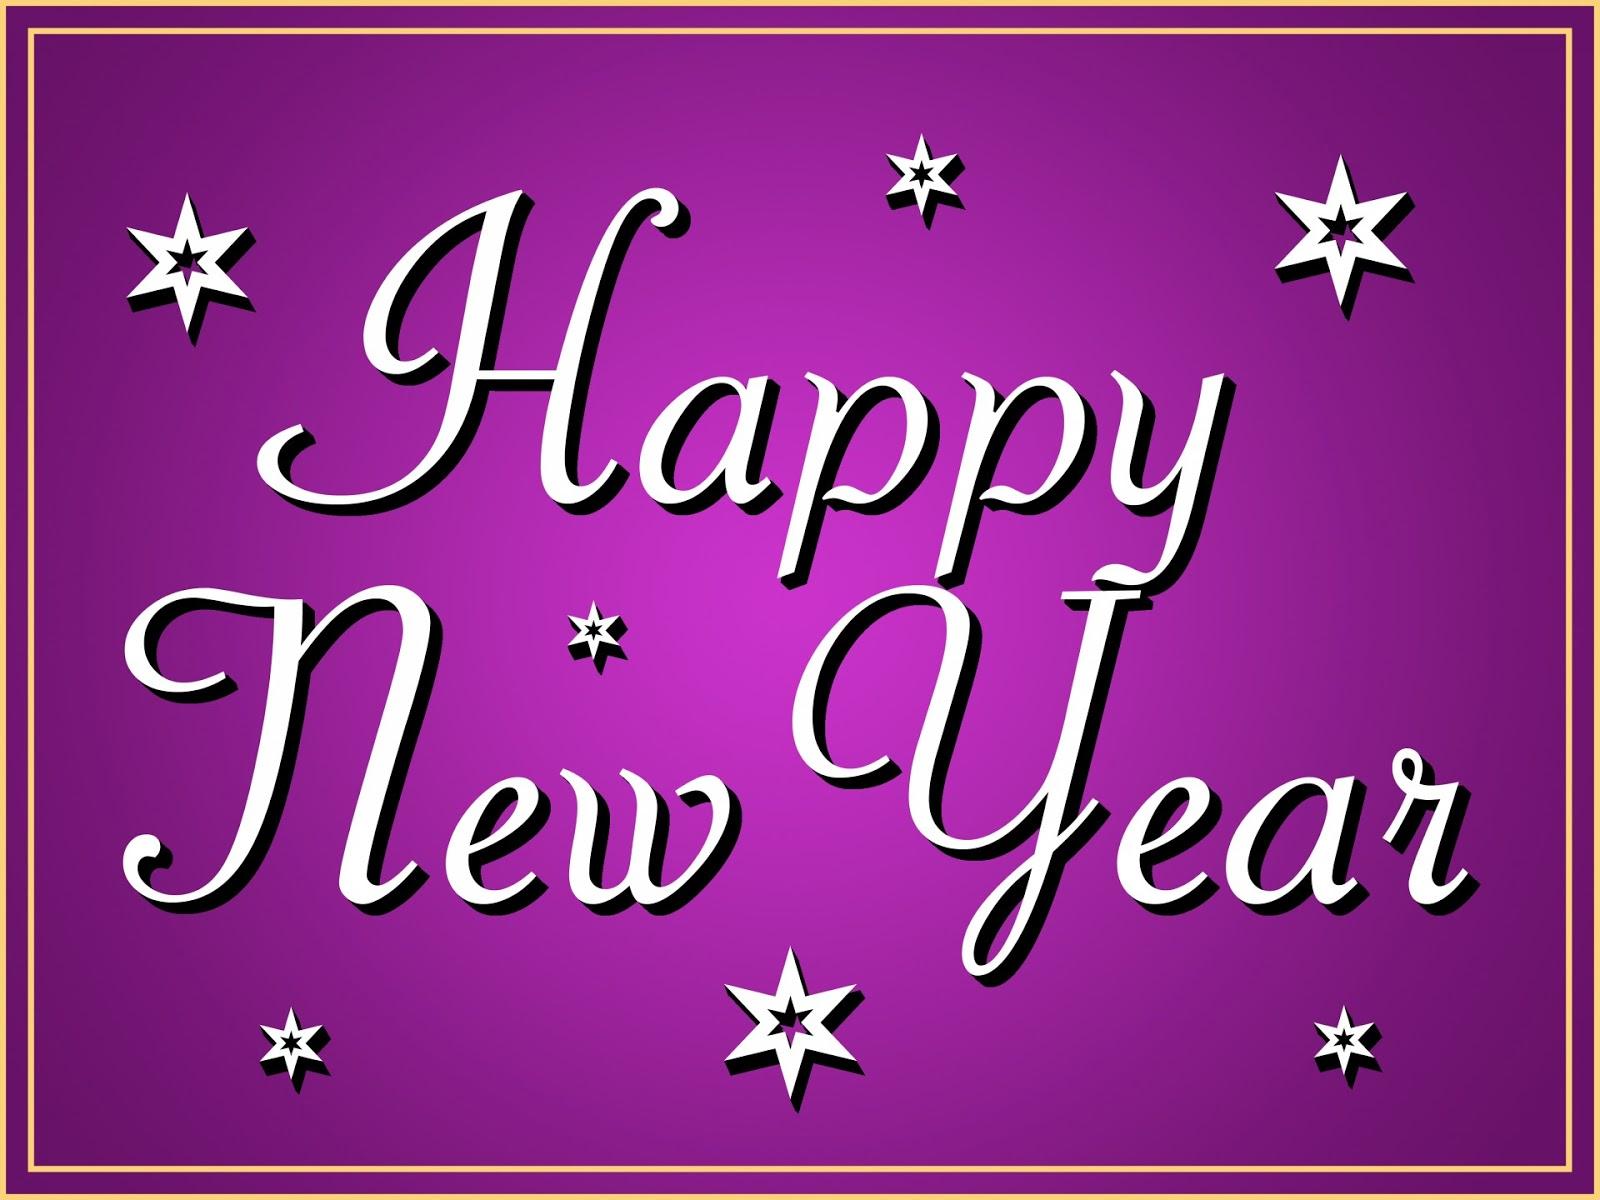 Happy islamic new year greetings card ecards cliparts 2017 happy islamic new year0 ecard kristyandbryce Choice Image